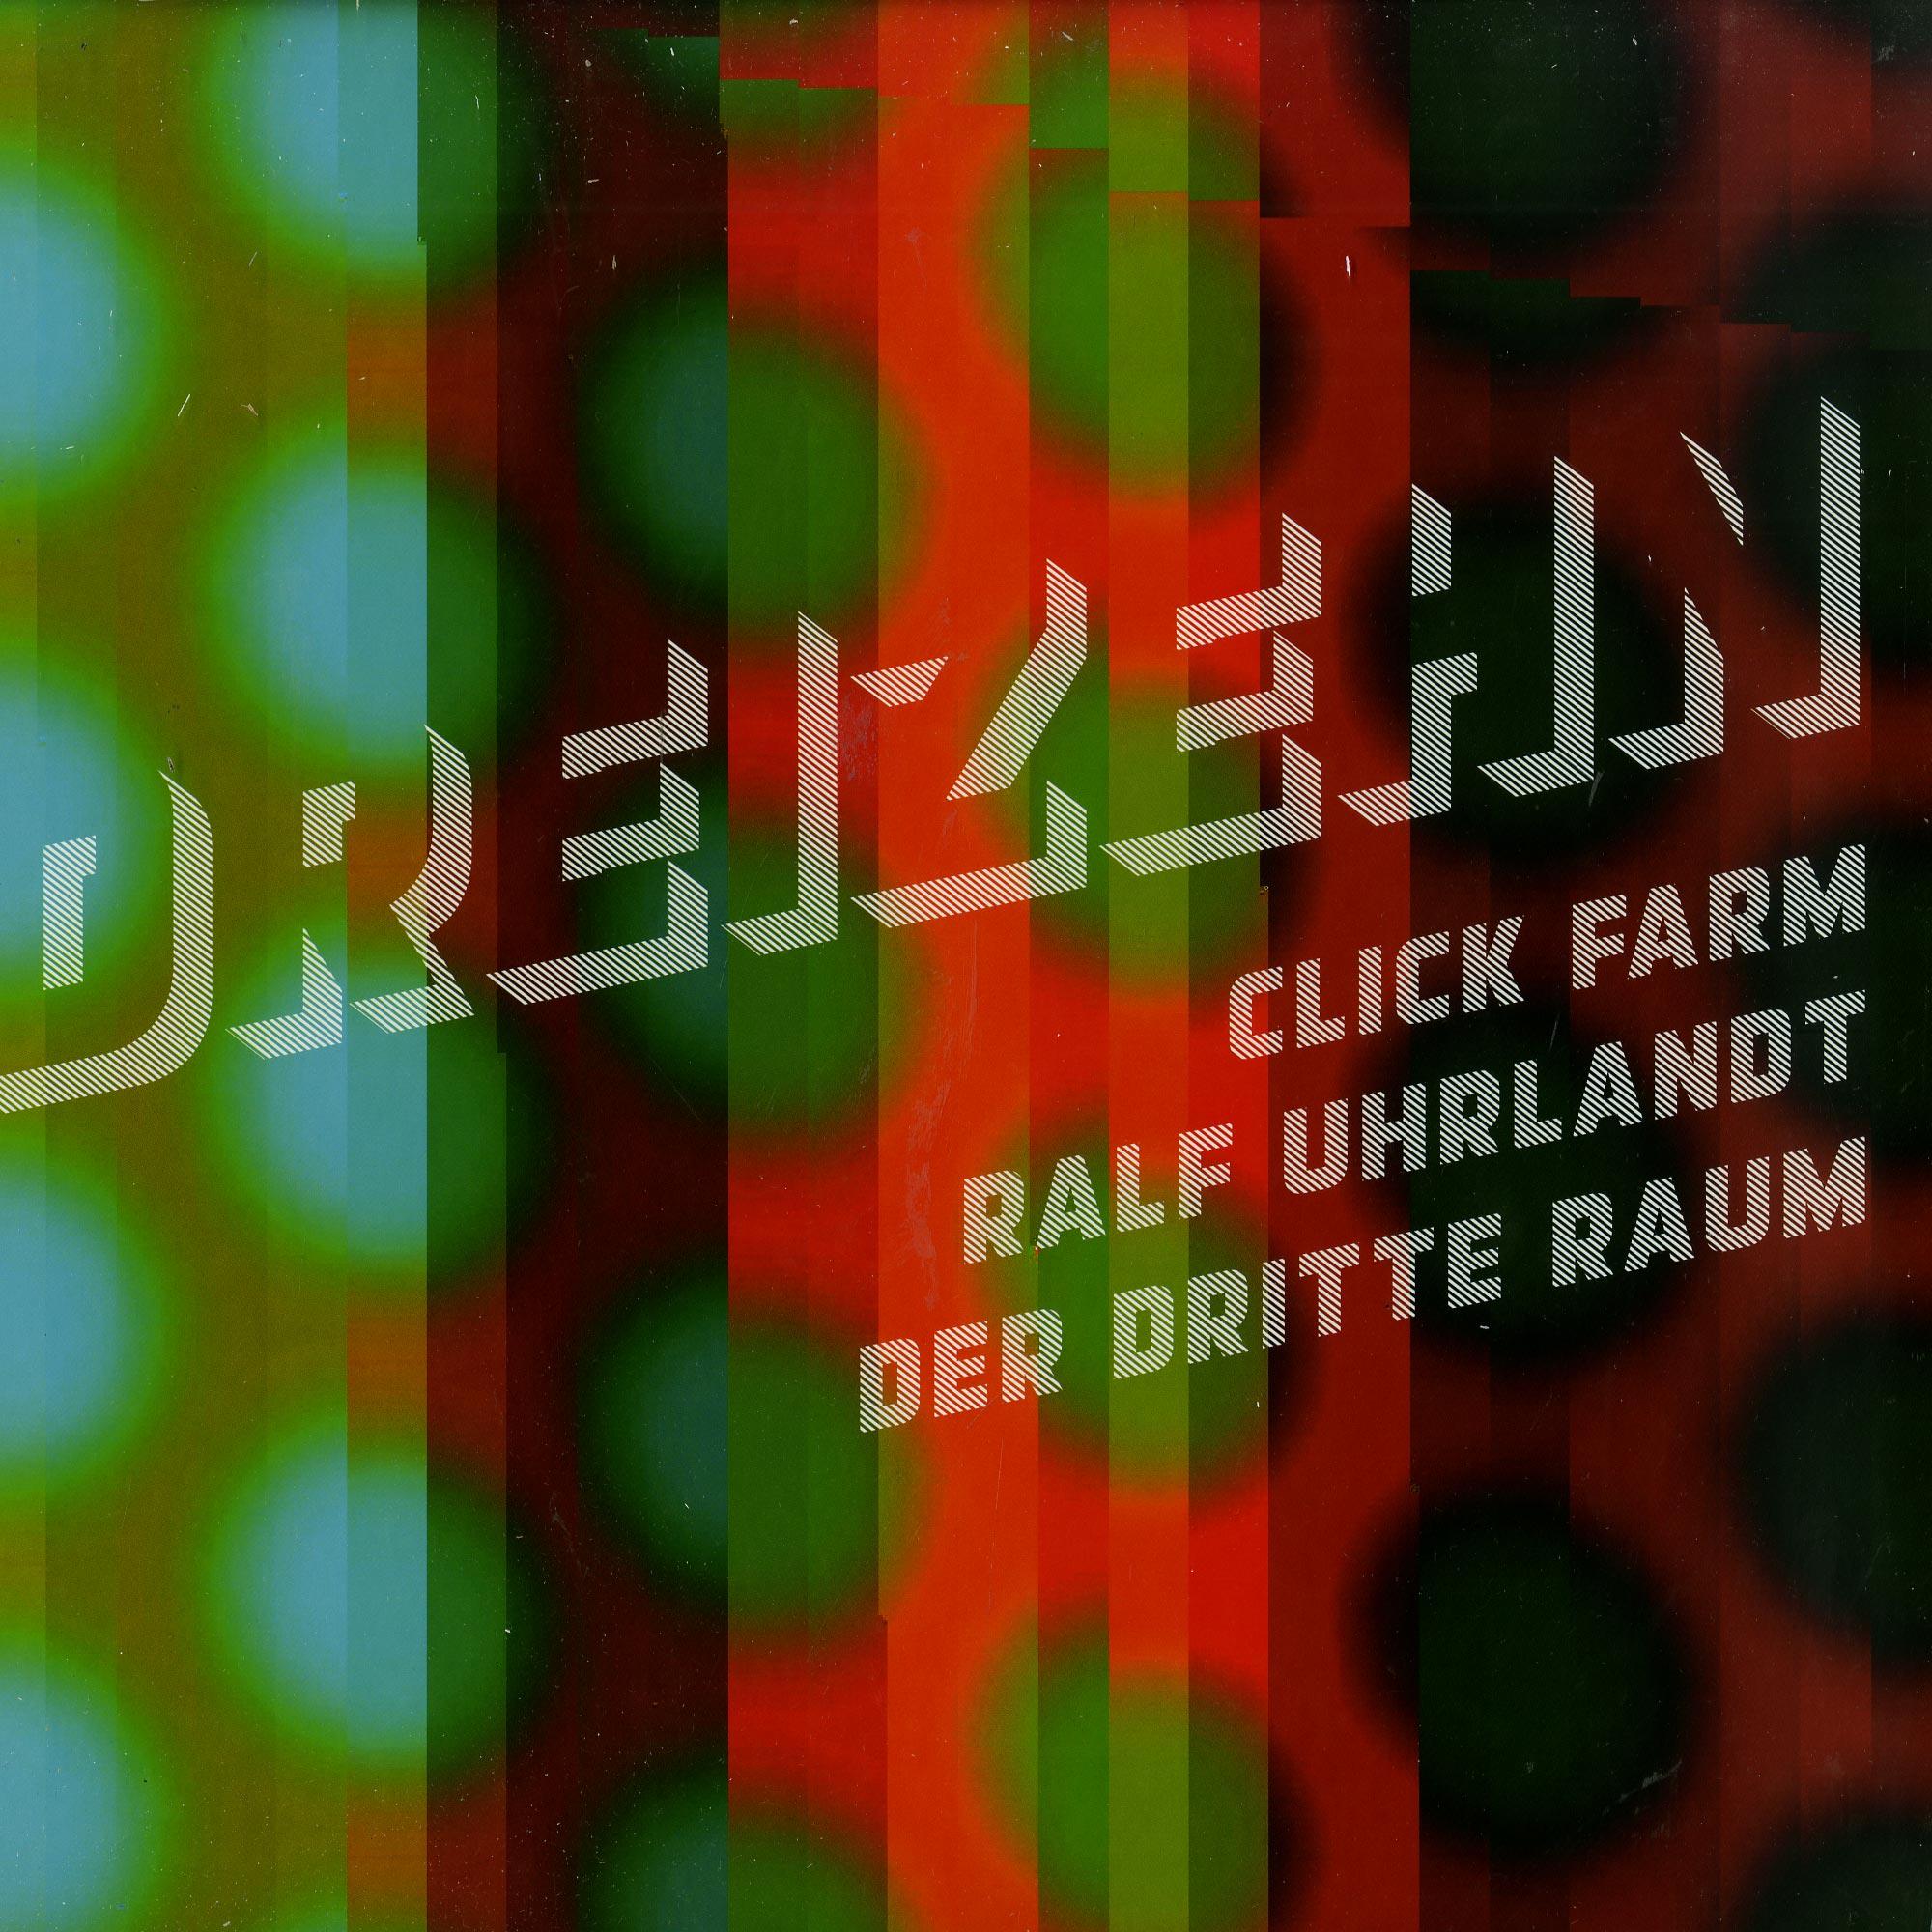 Der Dritte Raum, Ralf Uhrland, Click Far - DREIZEHN